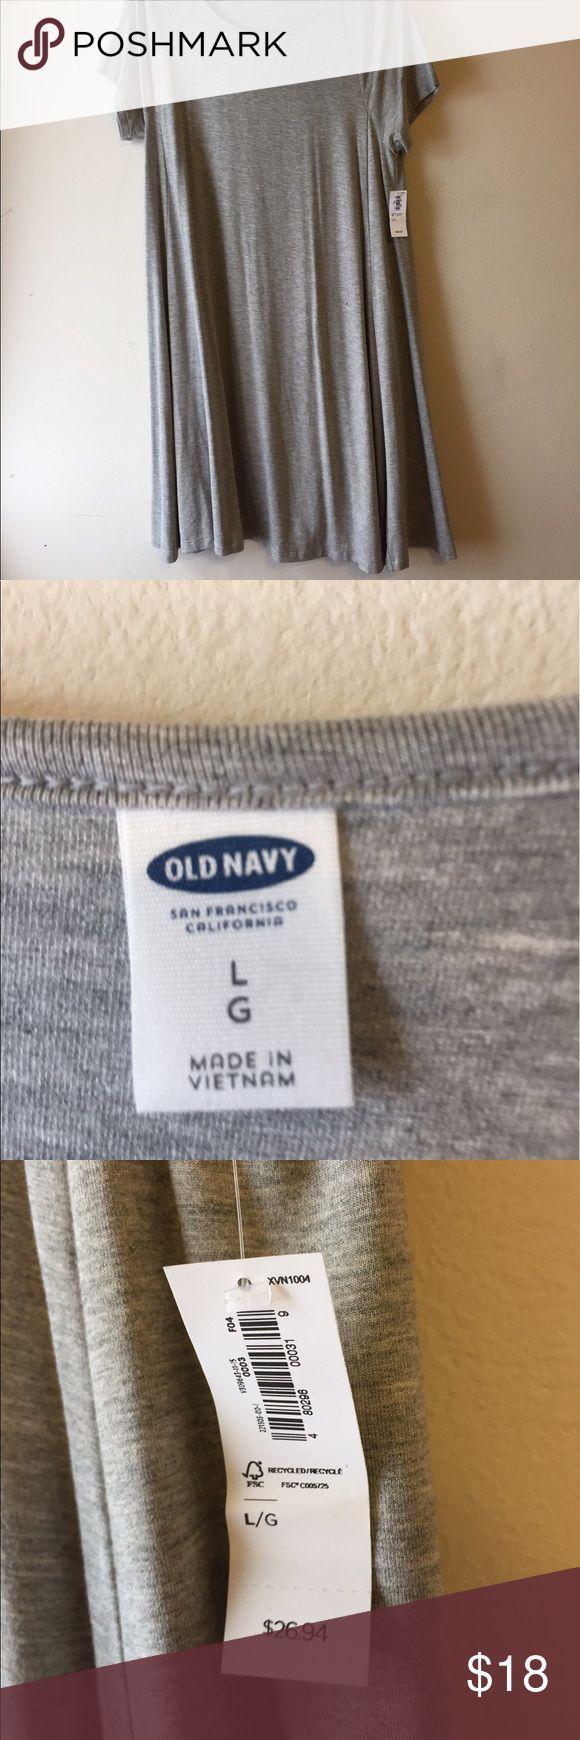 Old Navy jersey swing dress Short Sleeve Dress ⭐️❗️BUNDLE for special price ❗️⭐️ Old Navy Dresses Midi